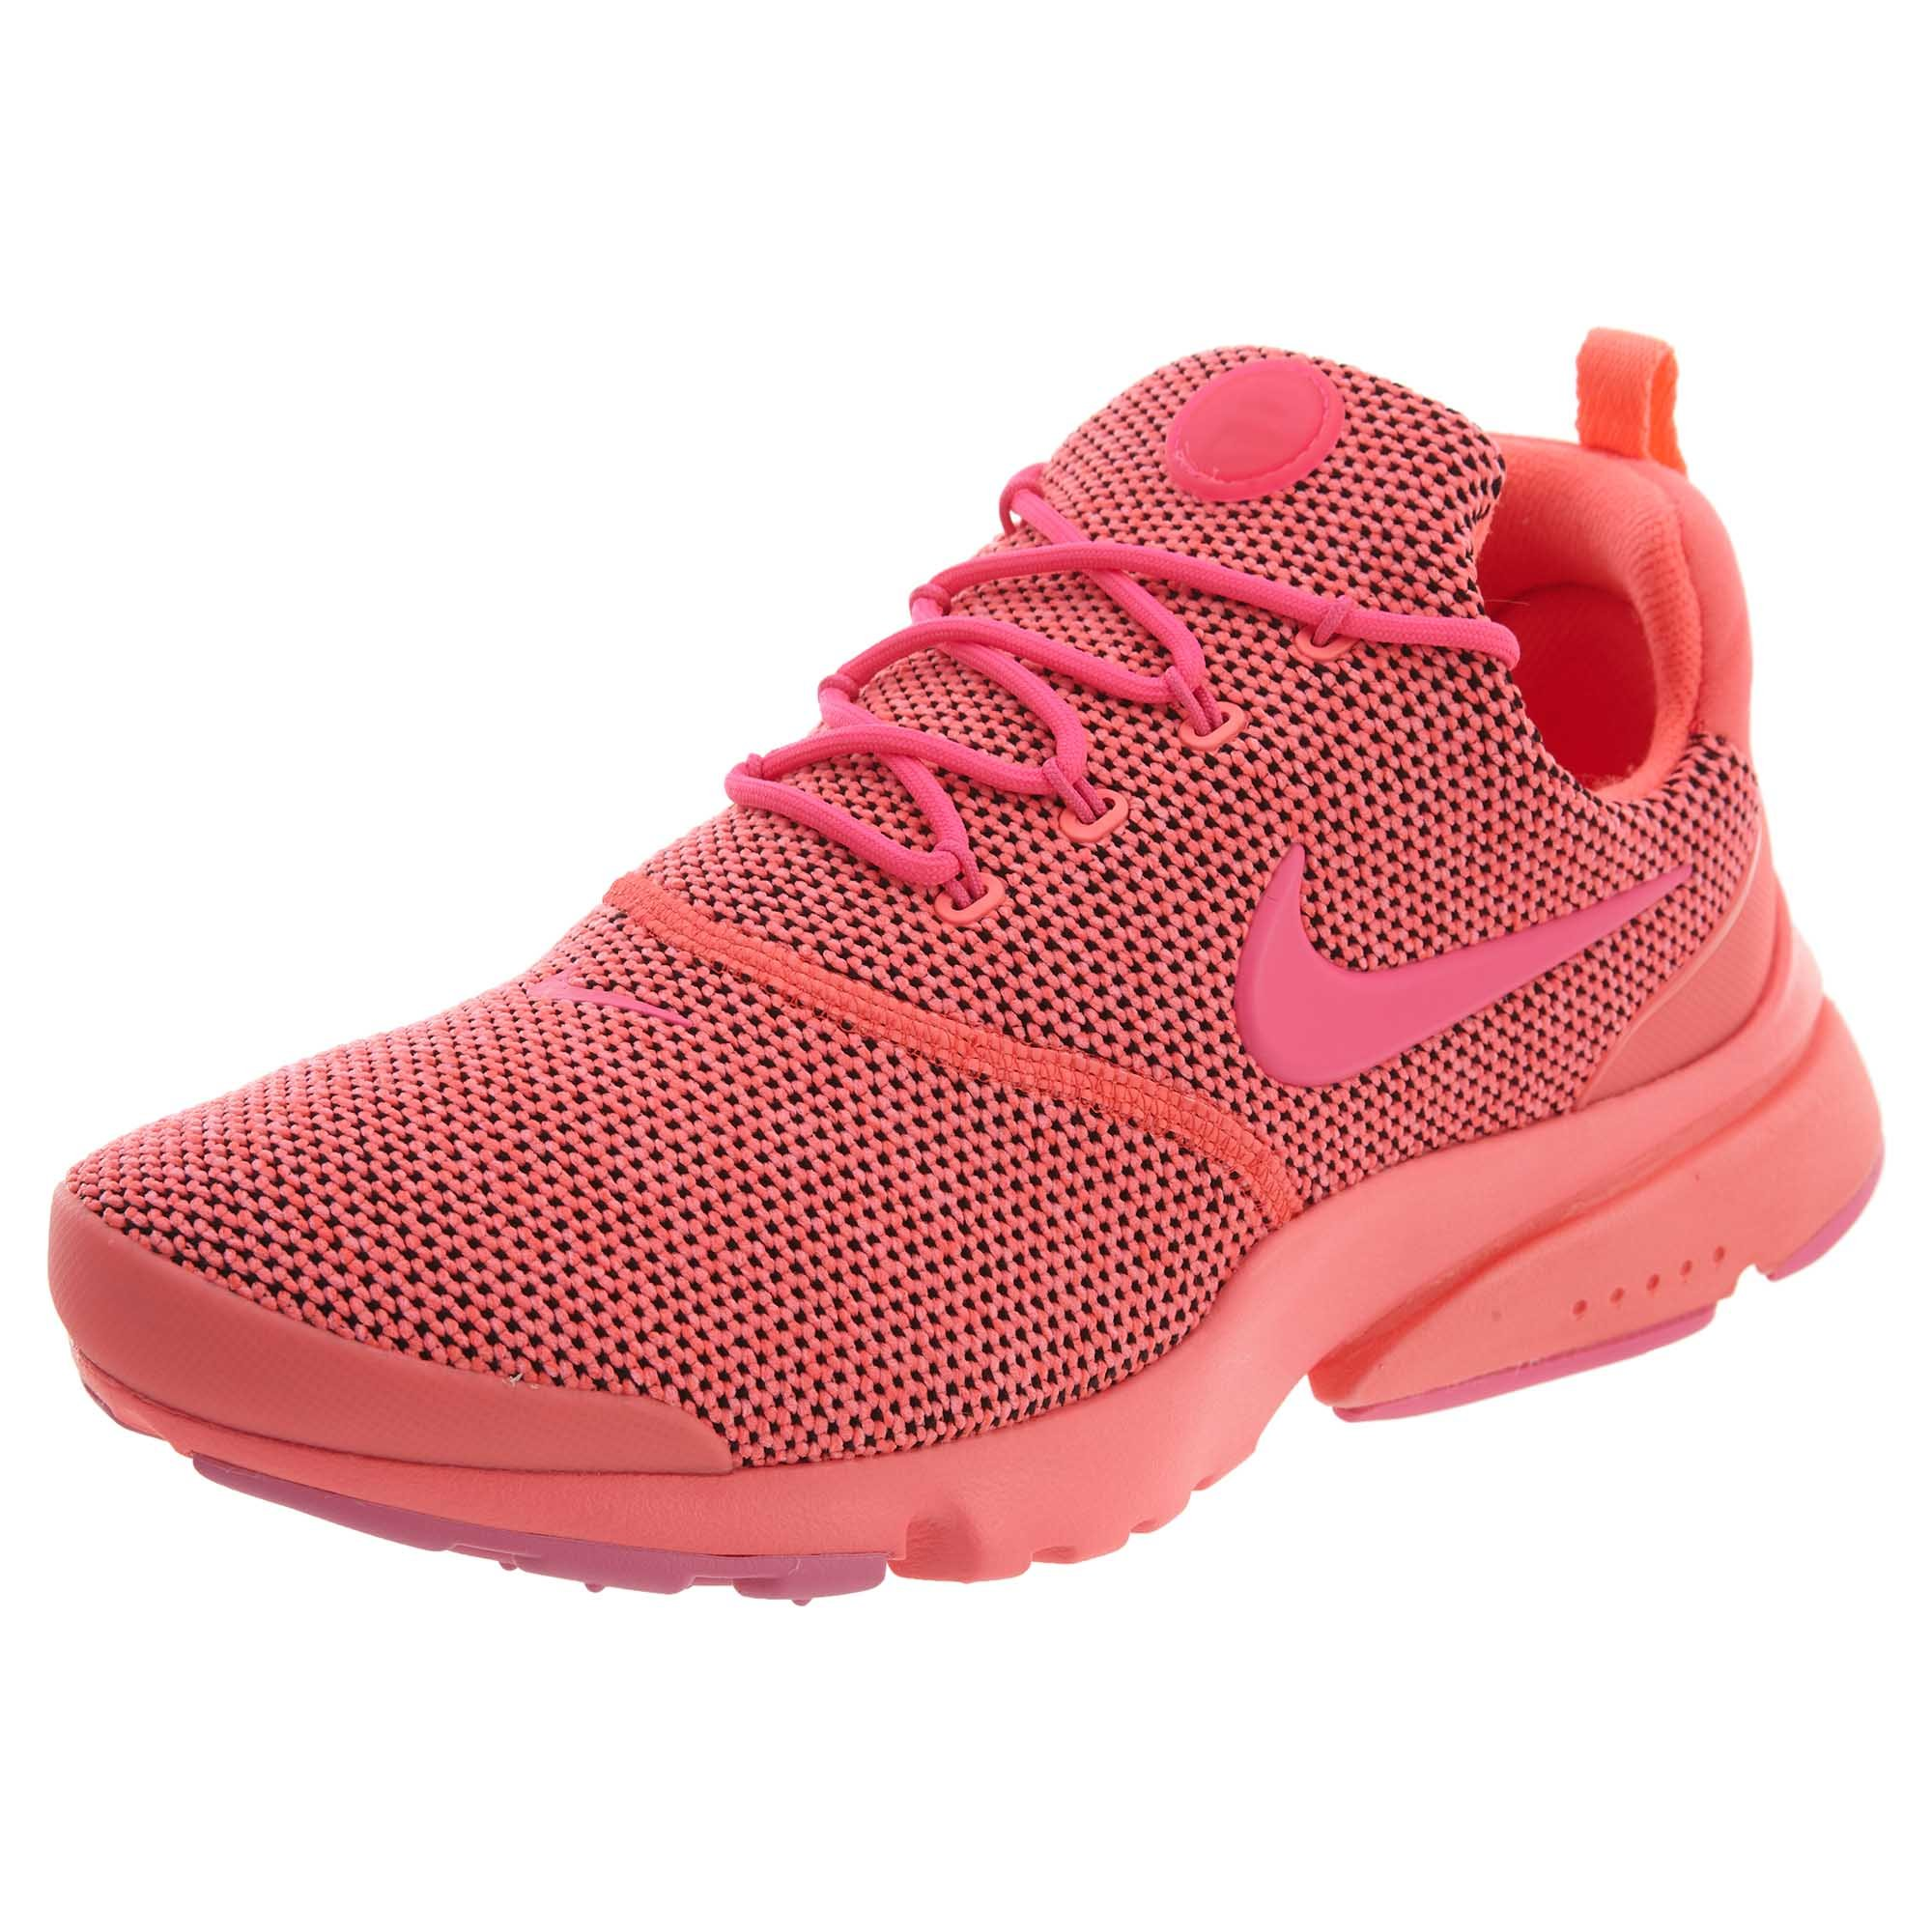 wholesale dealer 374c8 d031e Galleon - Nike Presto Fly SE Women s Running Shoes 910570-604 (10)